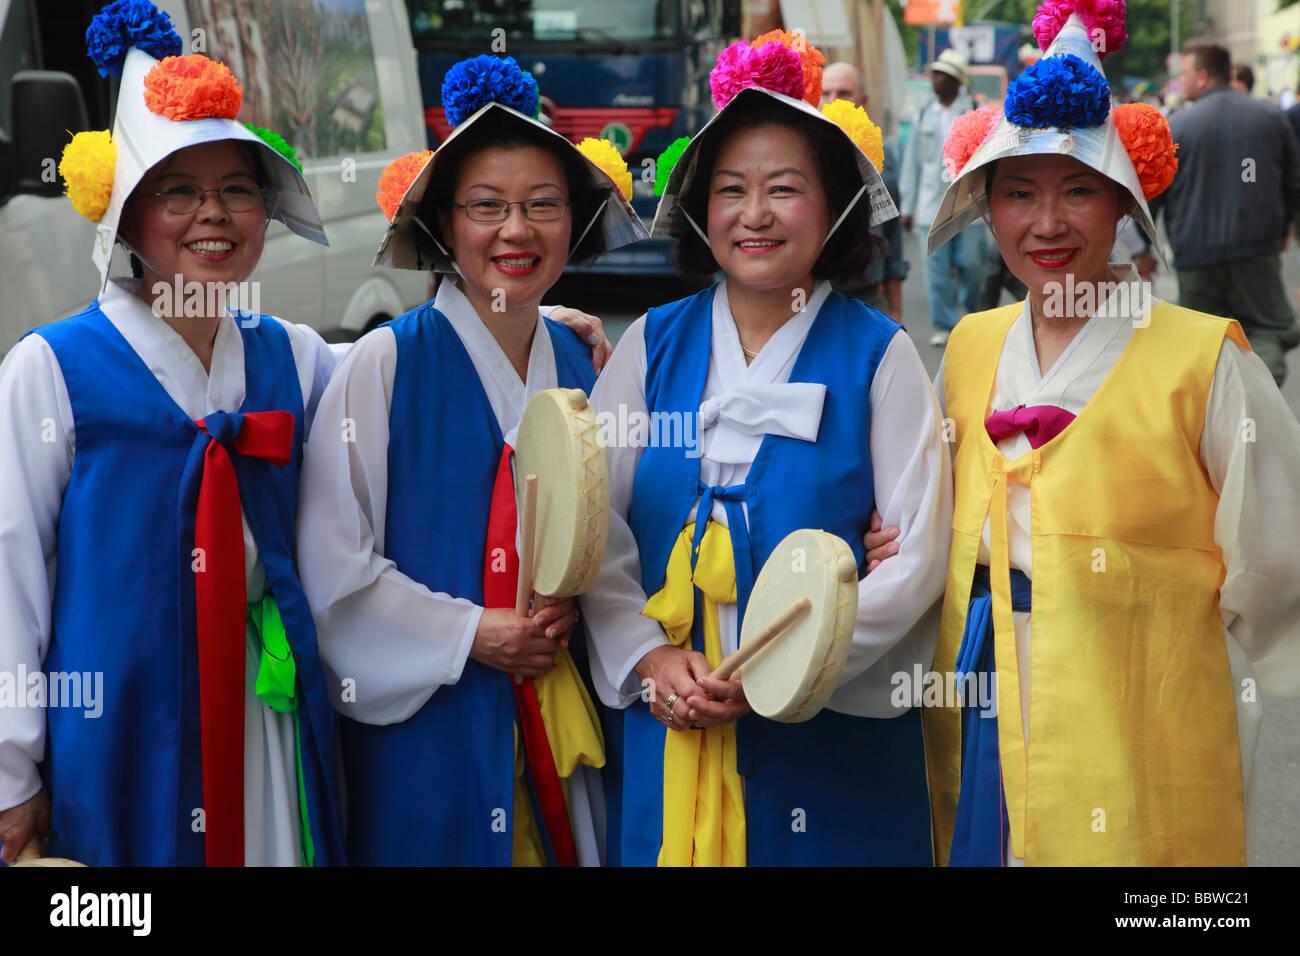 Deutschland Berlin Karneval der Kulturen koreanische Frauen in traditioneller Tracht Stockbild